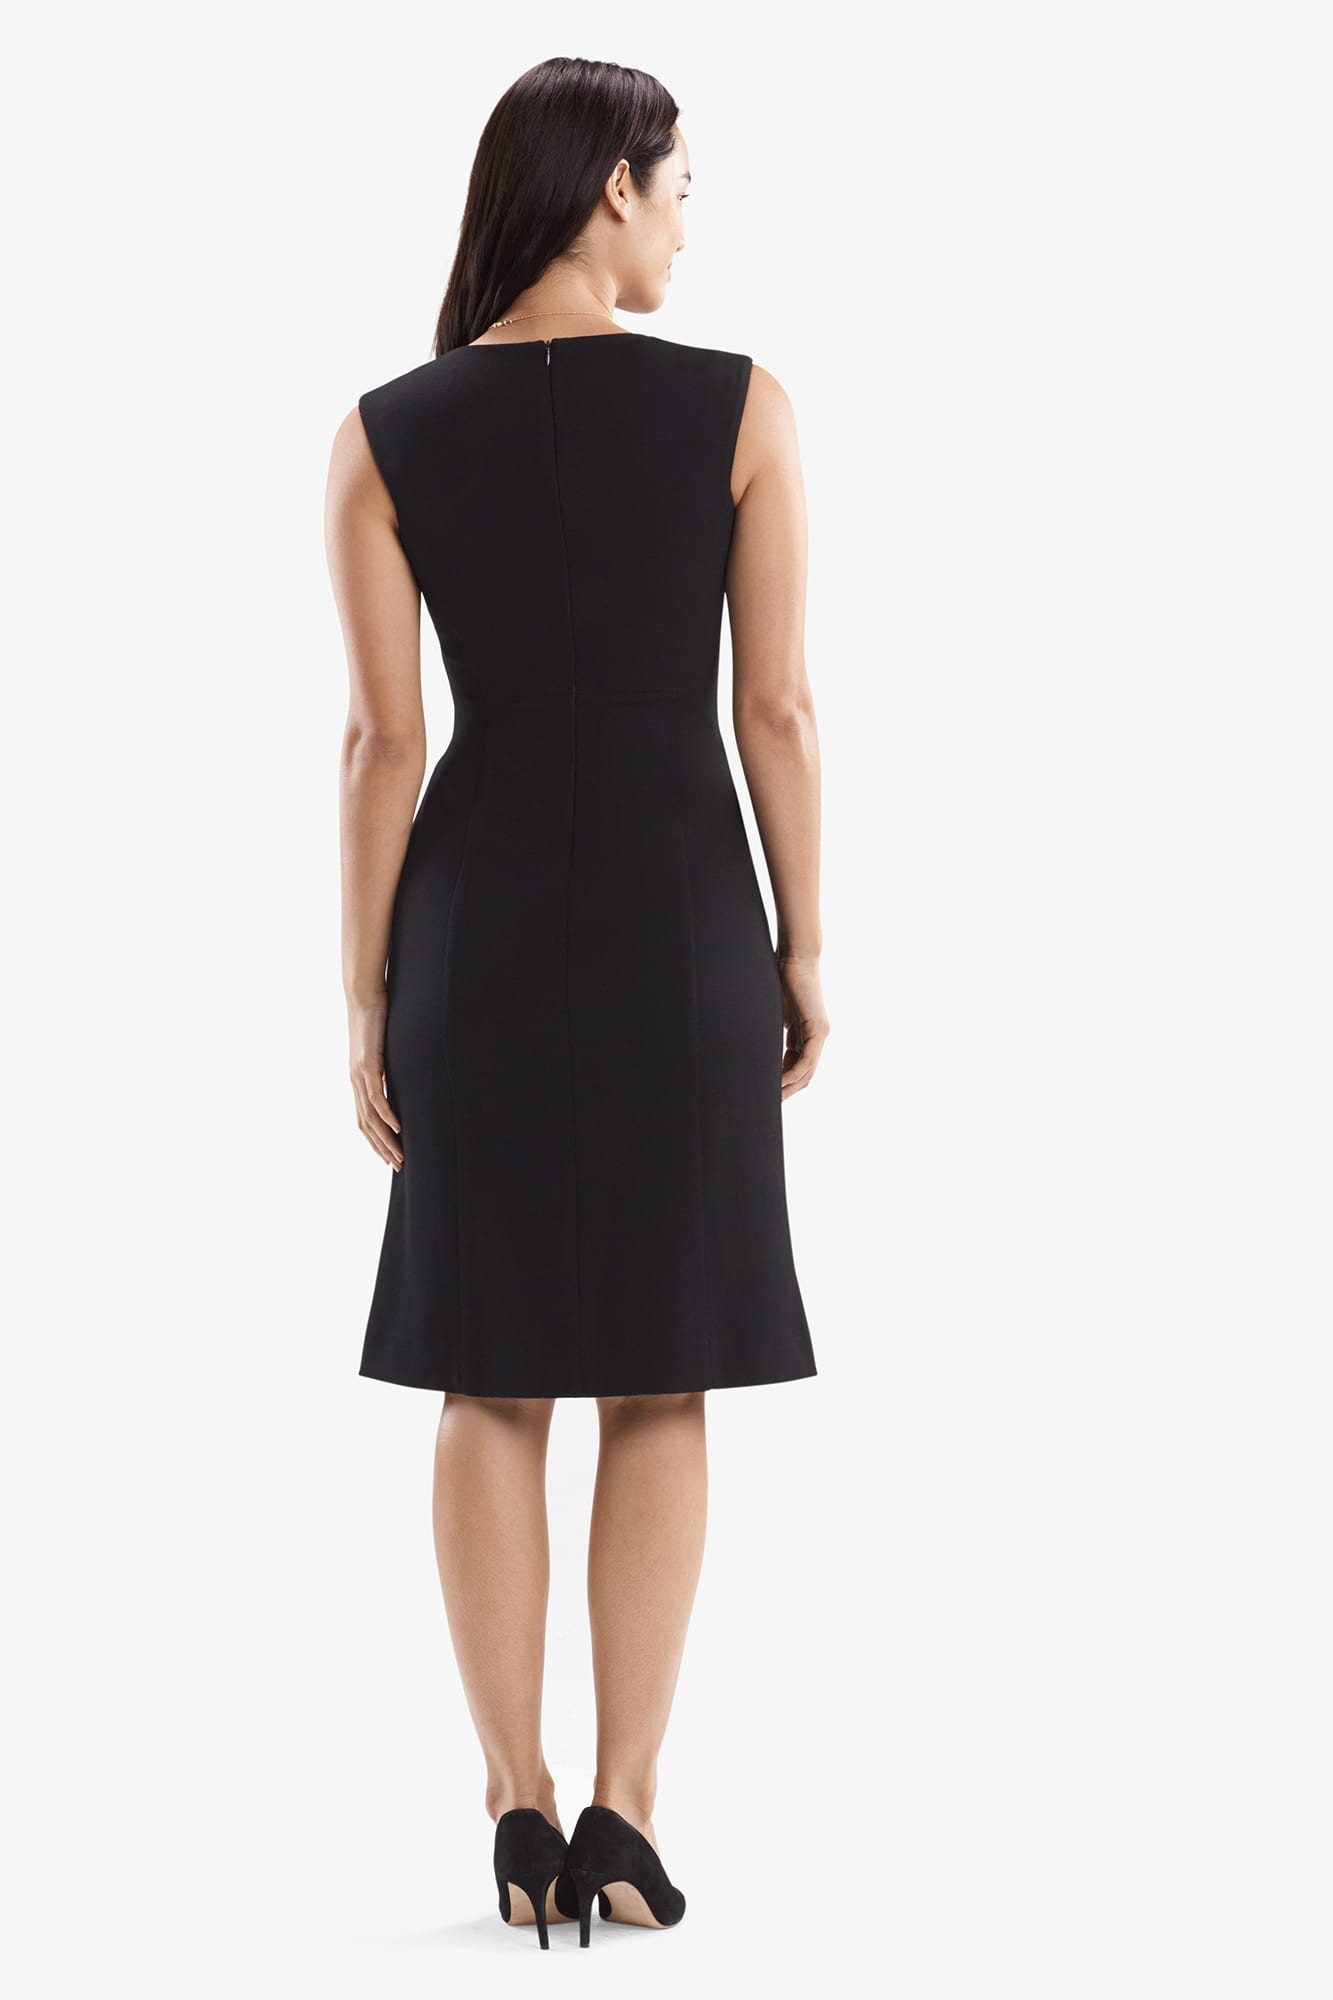 Evelyn Dress Textured Ponte Black M M Lafleur